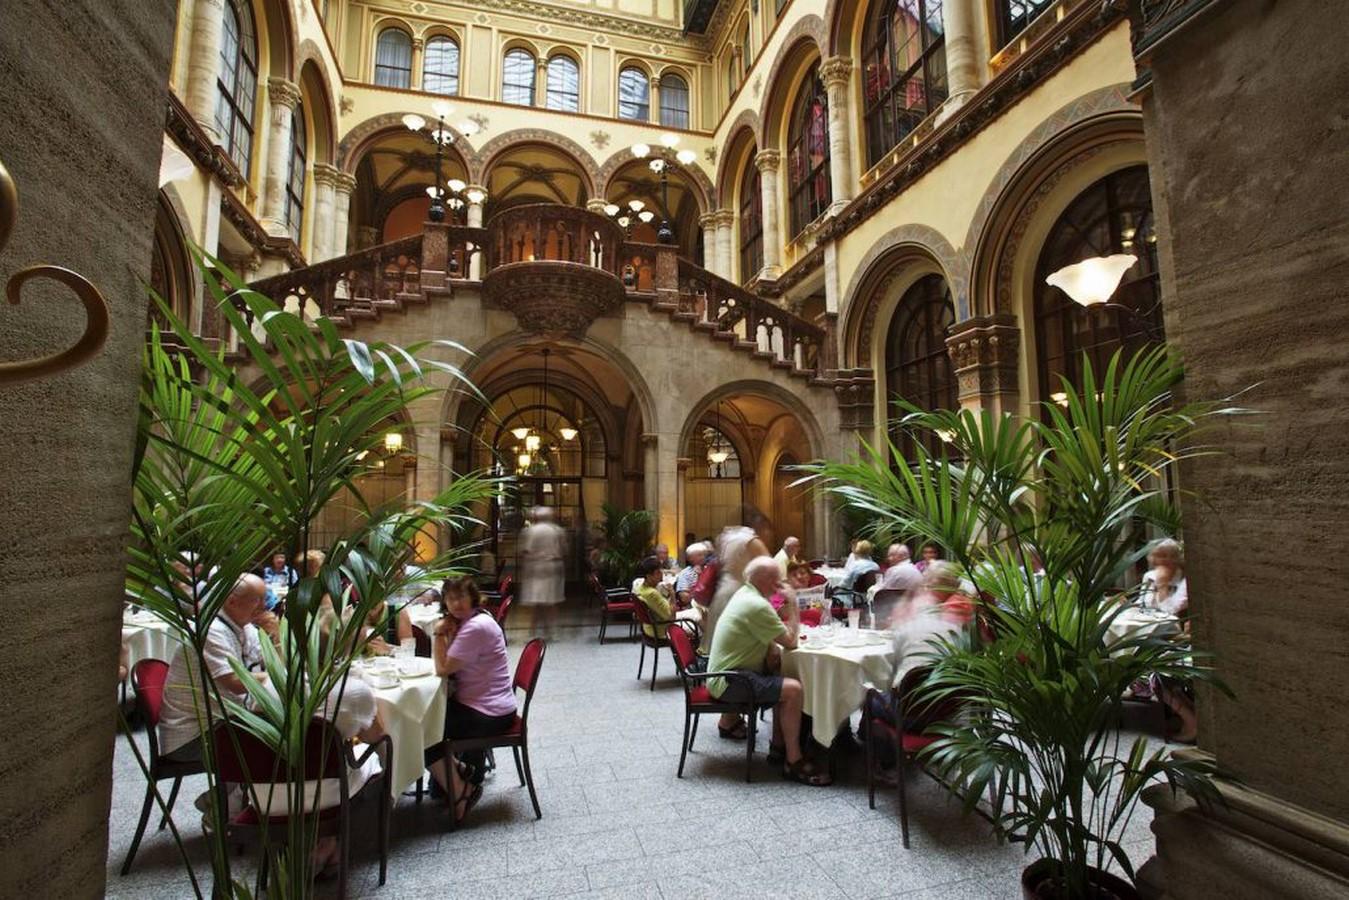 Café Central, Vienna: The Chess School - Sheet8